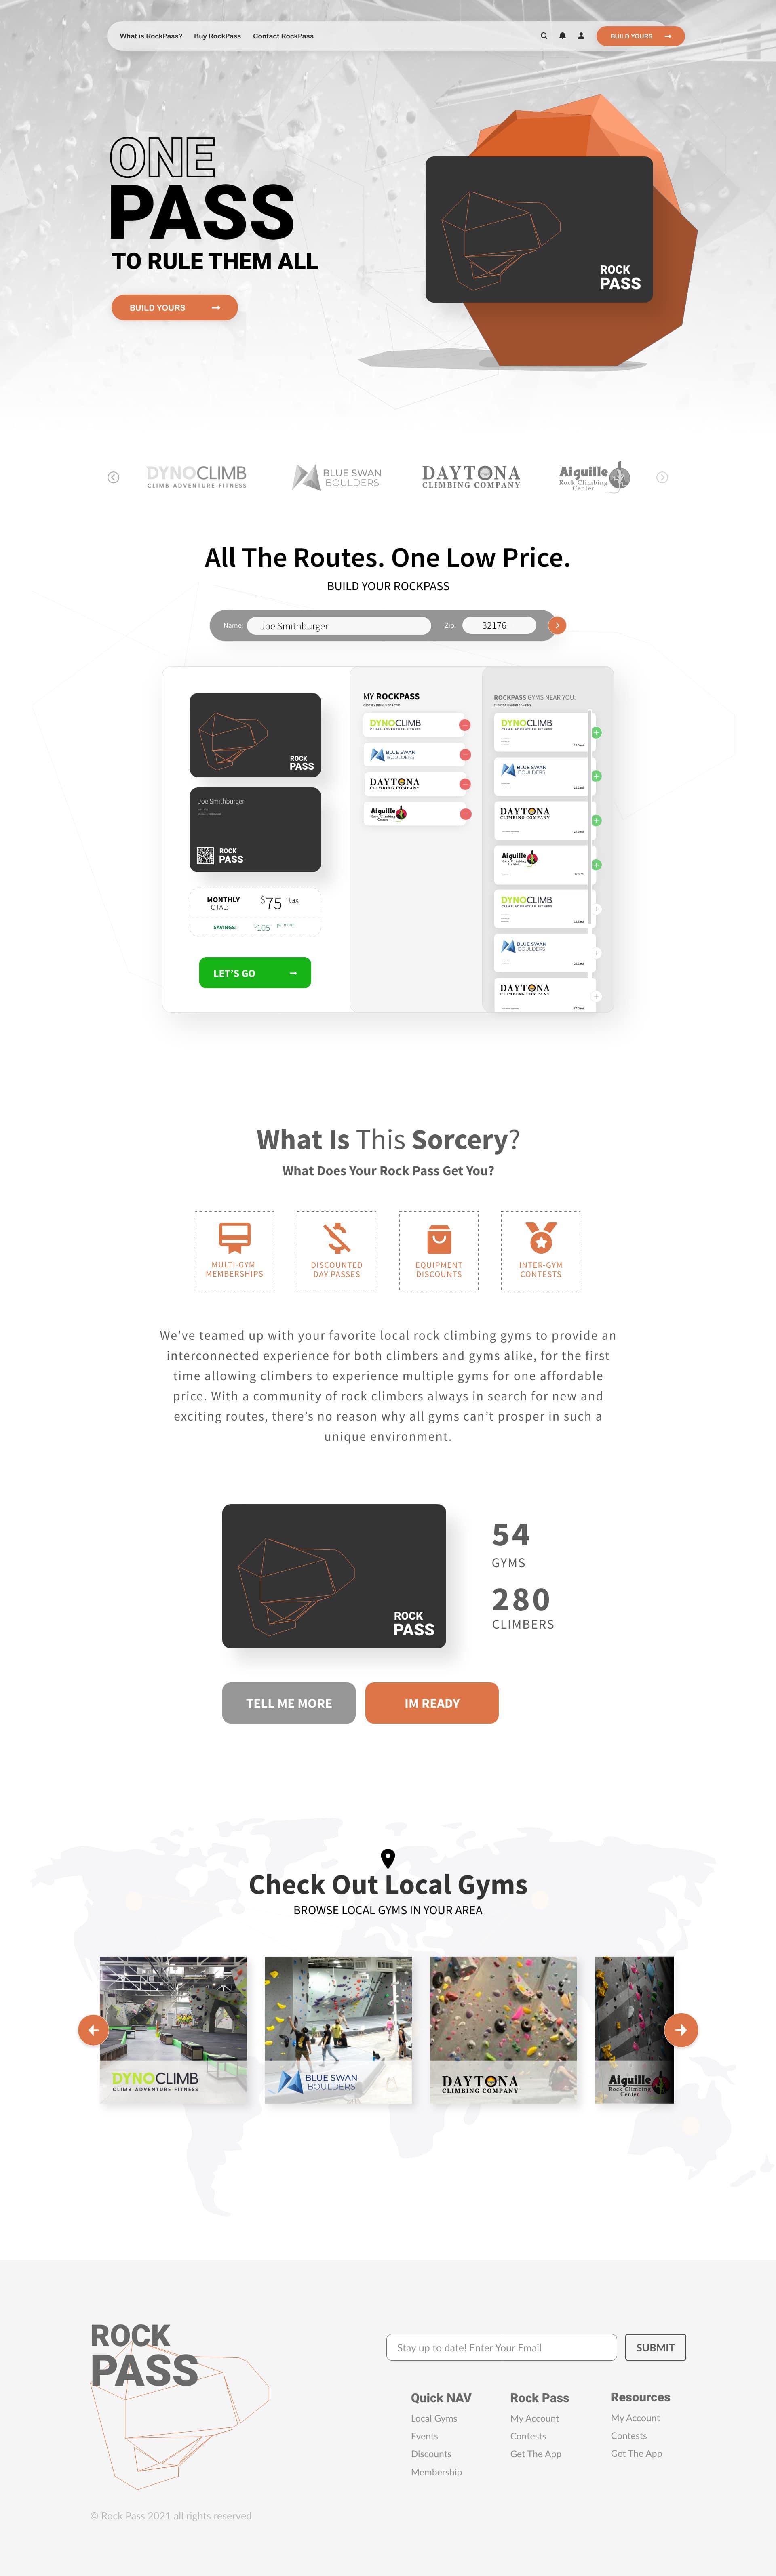 ux design full page image of custom adobe xd website design for Rock Pass